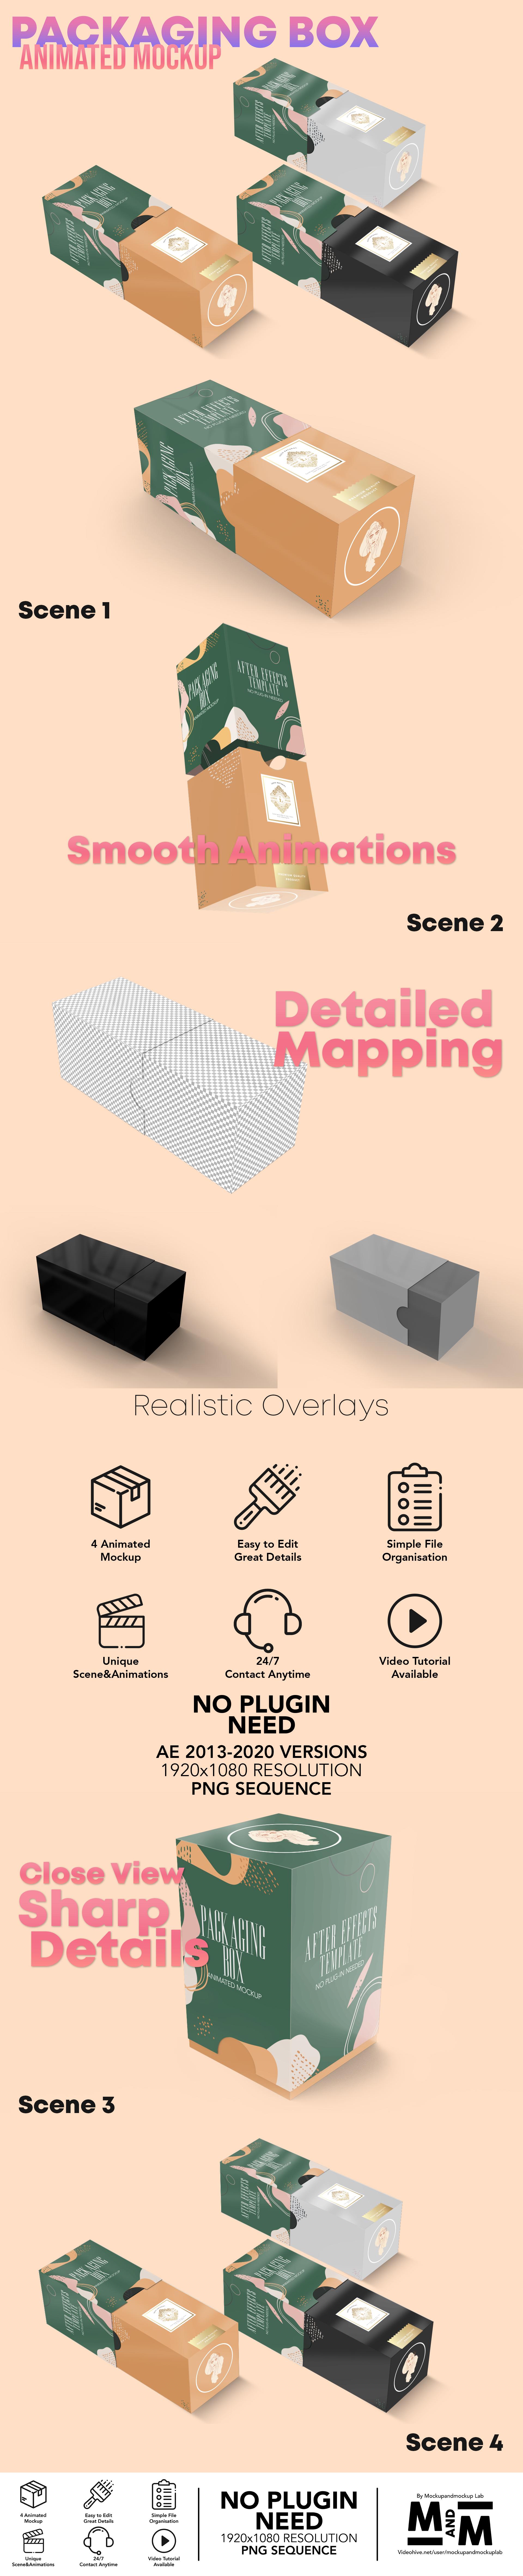 Packaging Box Animated Mockup - 3